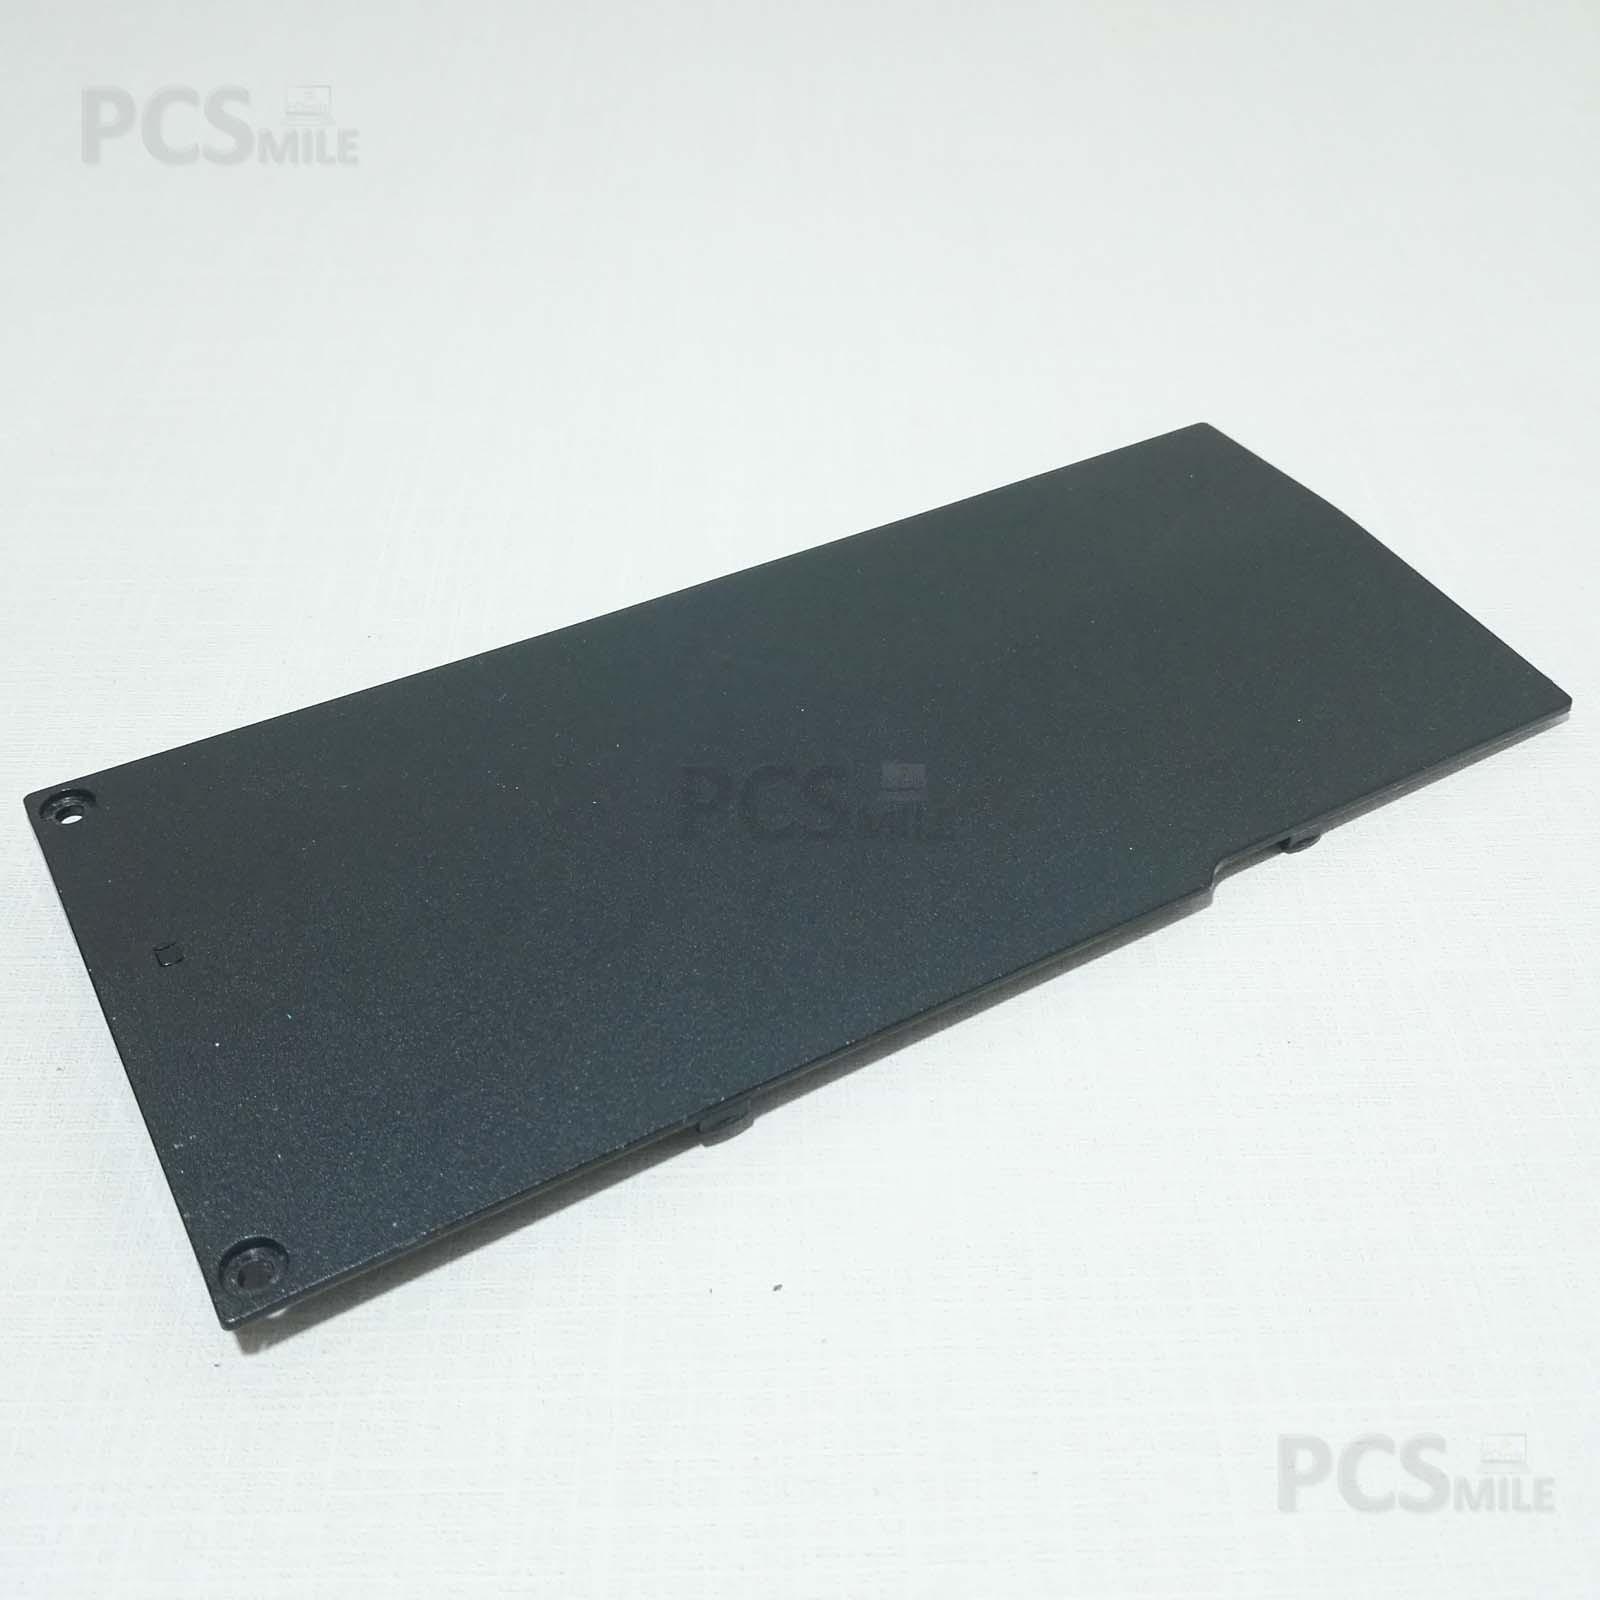 Sportellino APZHM000A00 Olidata tehom CW4800 Coperchio posteriore Hard disk RAM